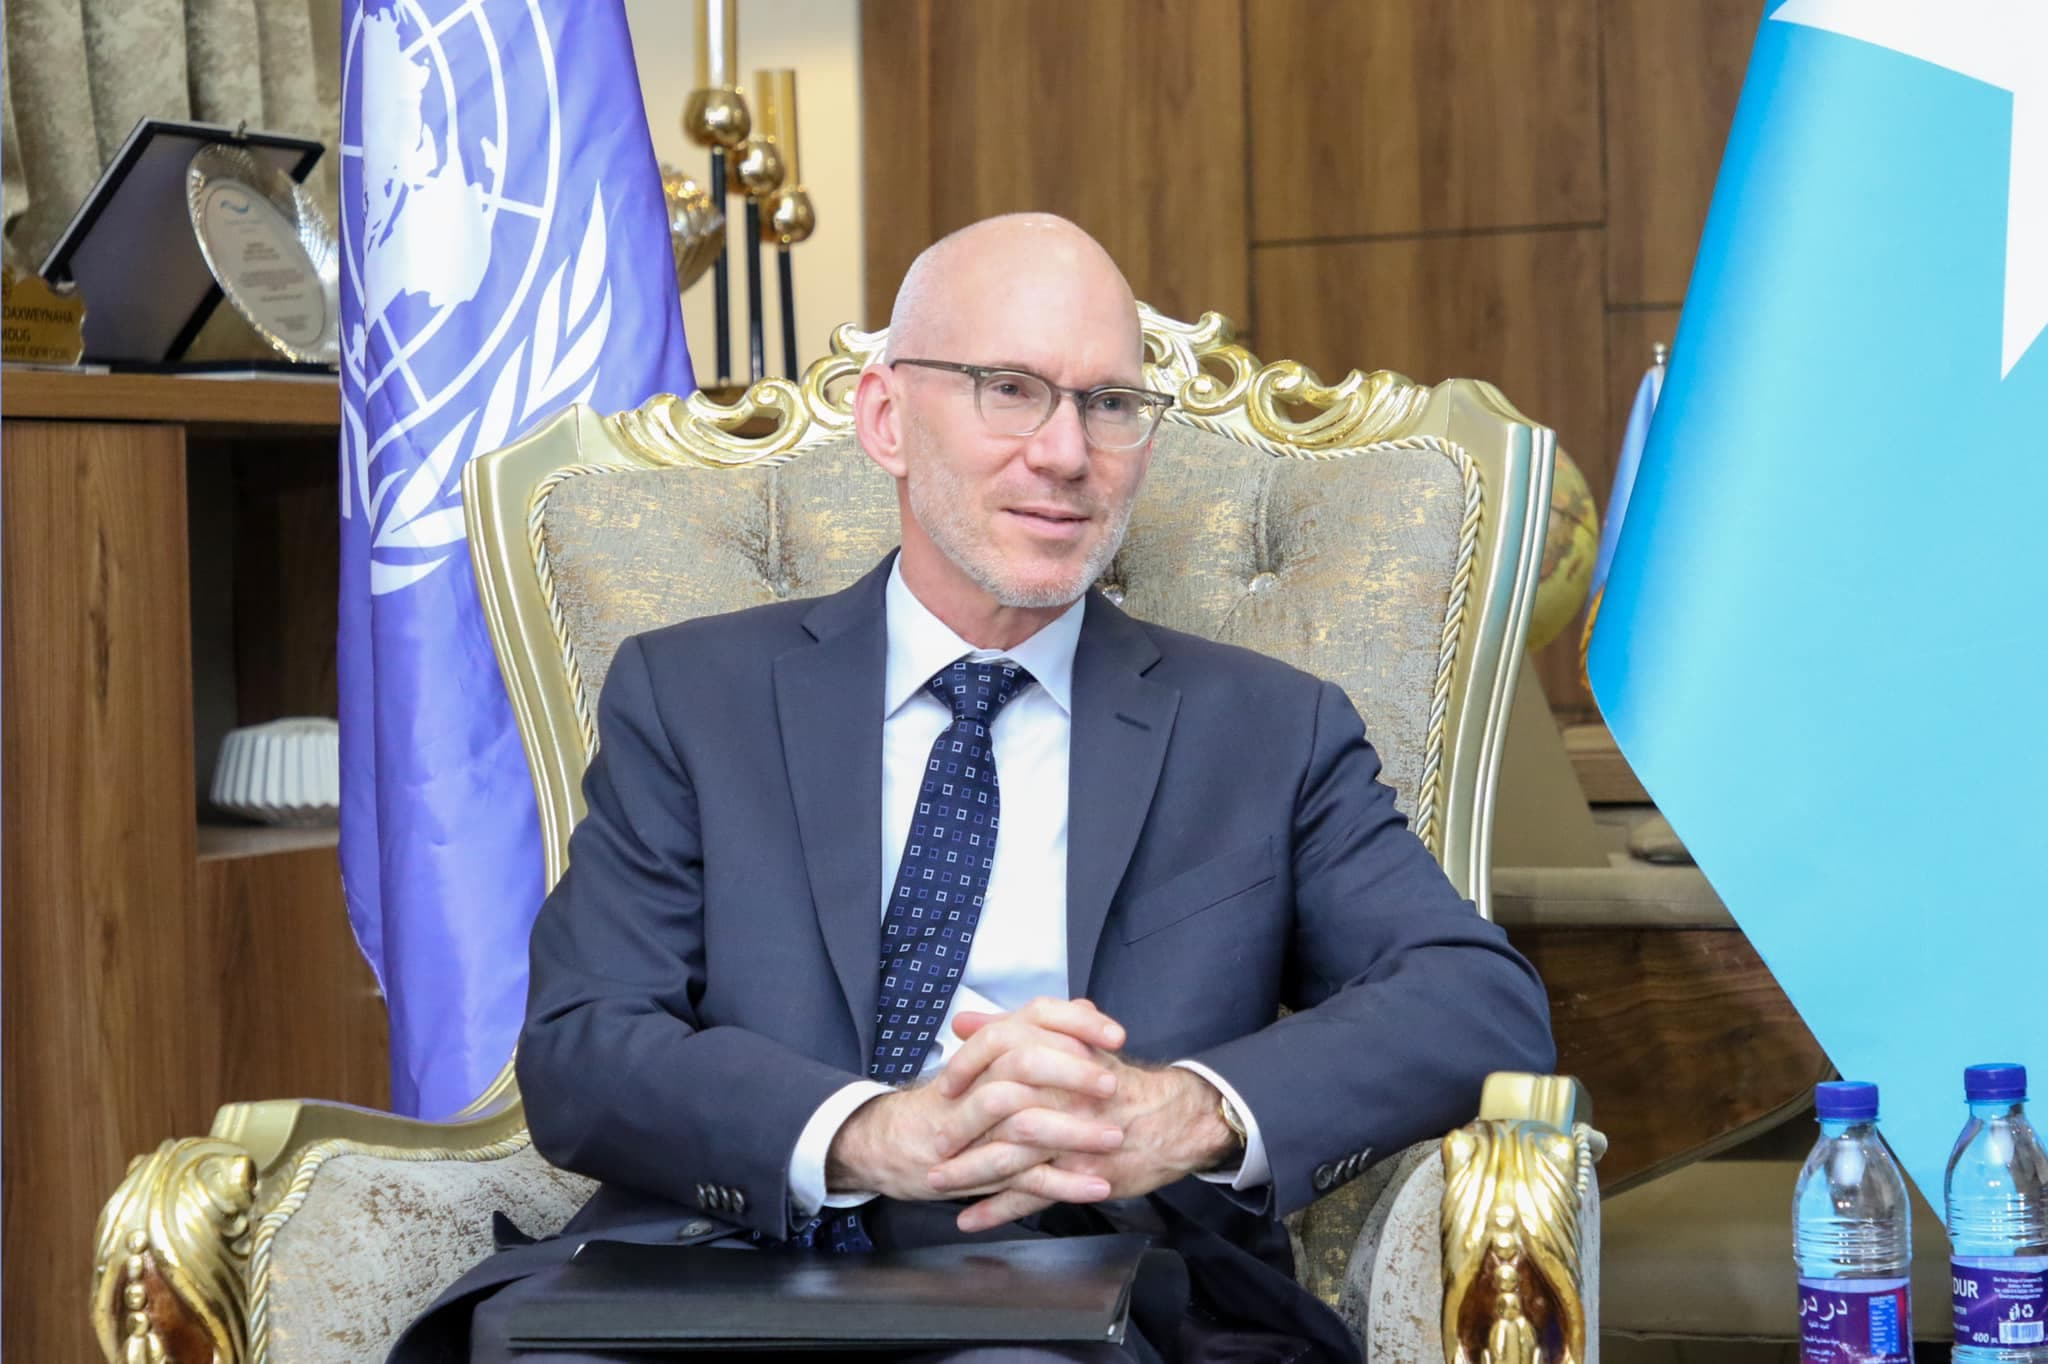 Completing electoral process 'critical' for Somalia: UN envoy